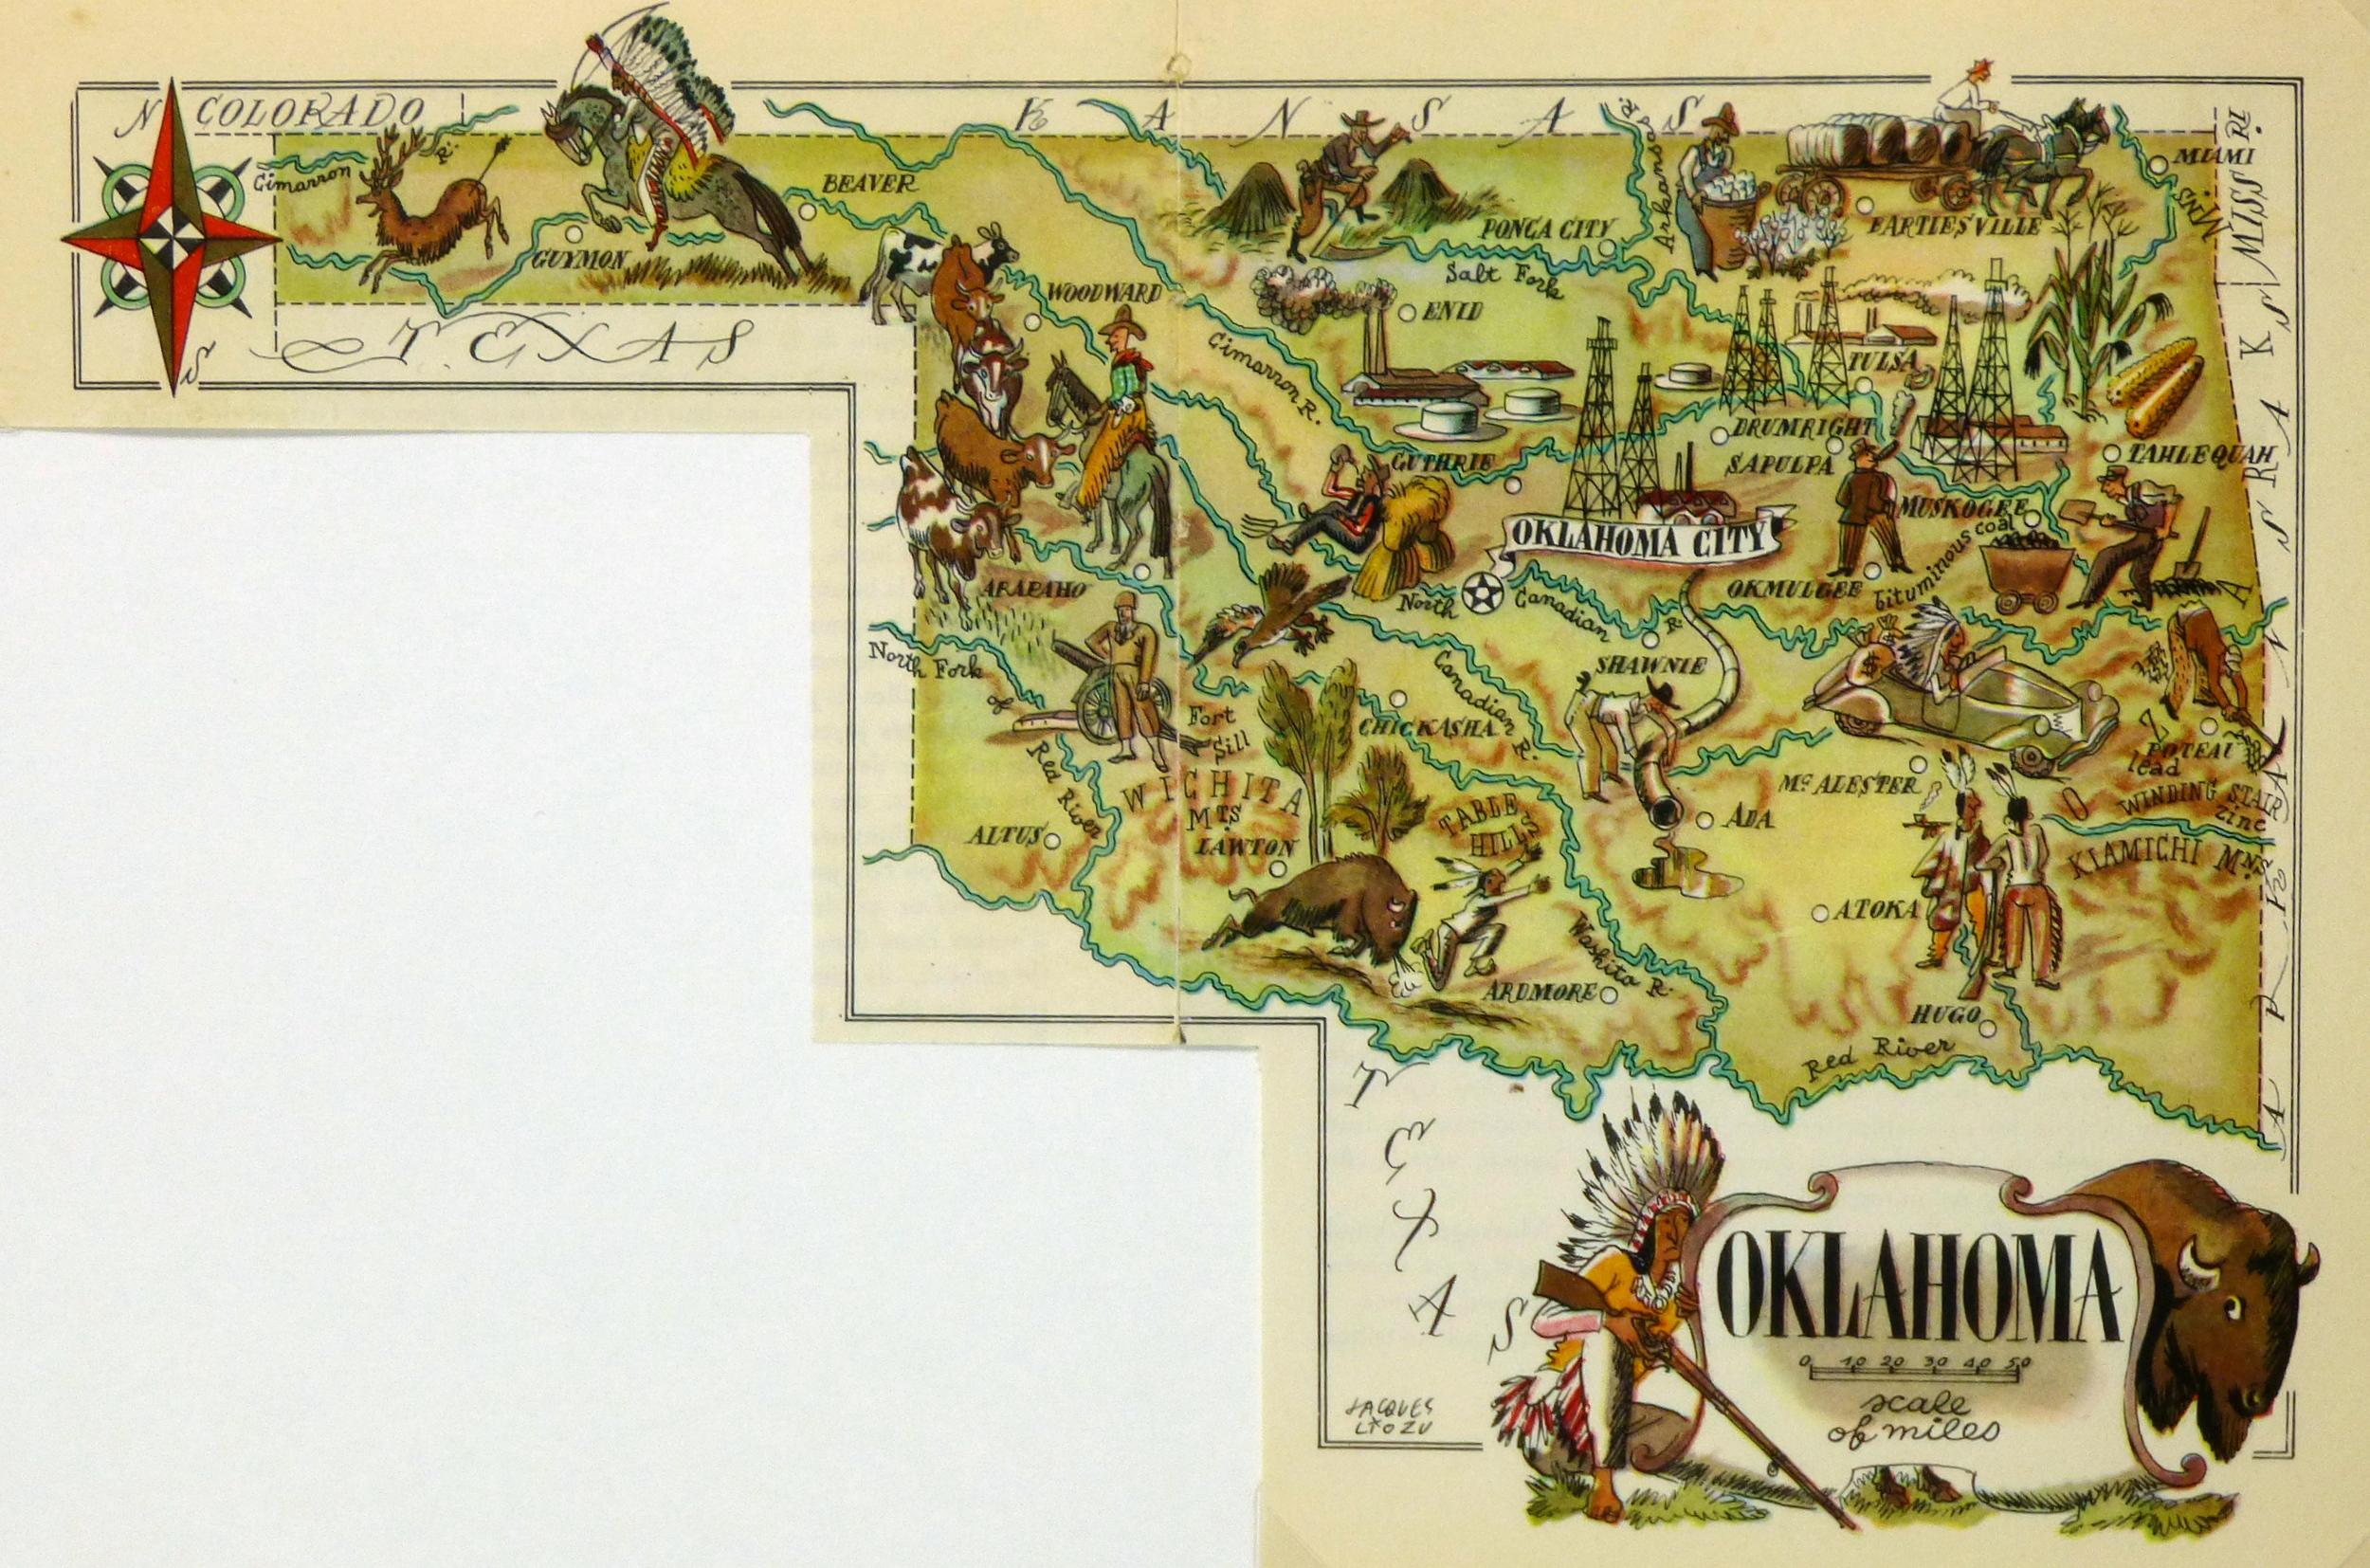 Oklahoma Pictorial Map, 1946-main-6264K